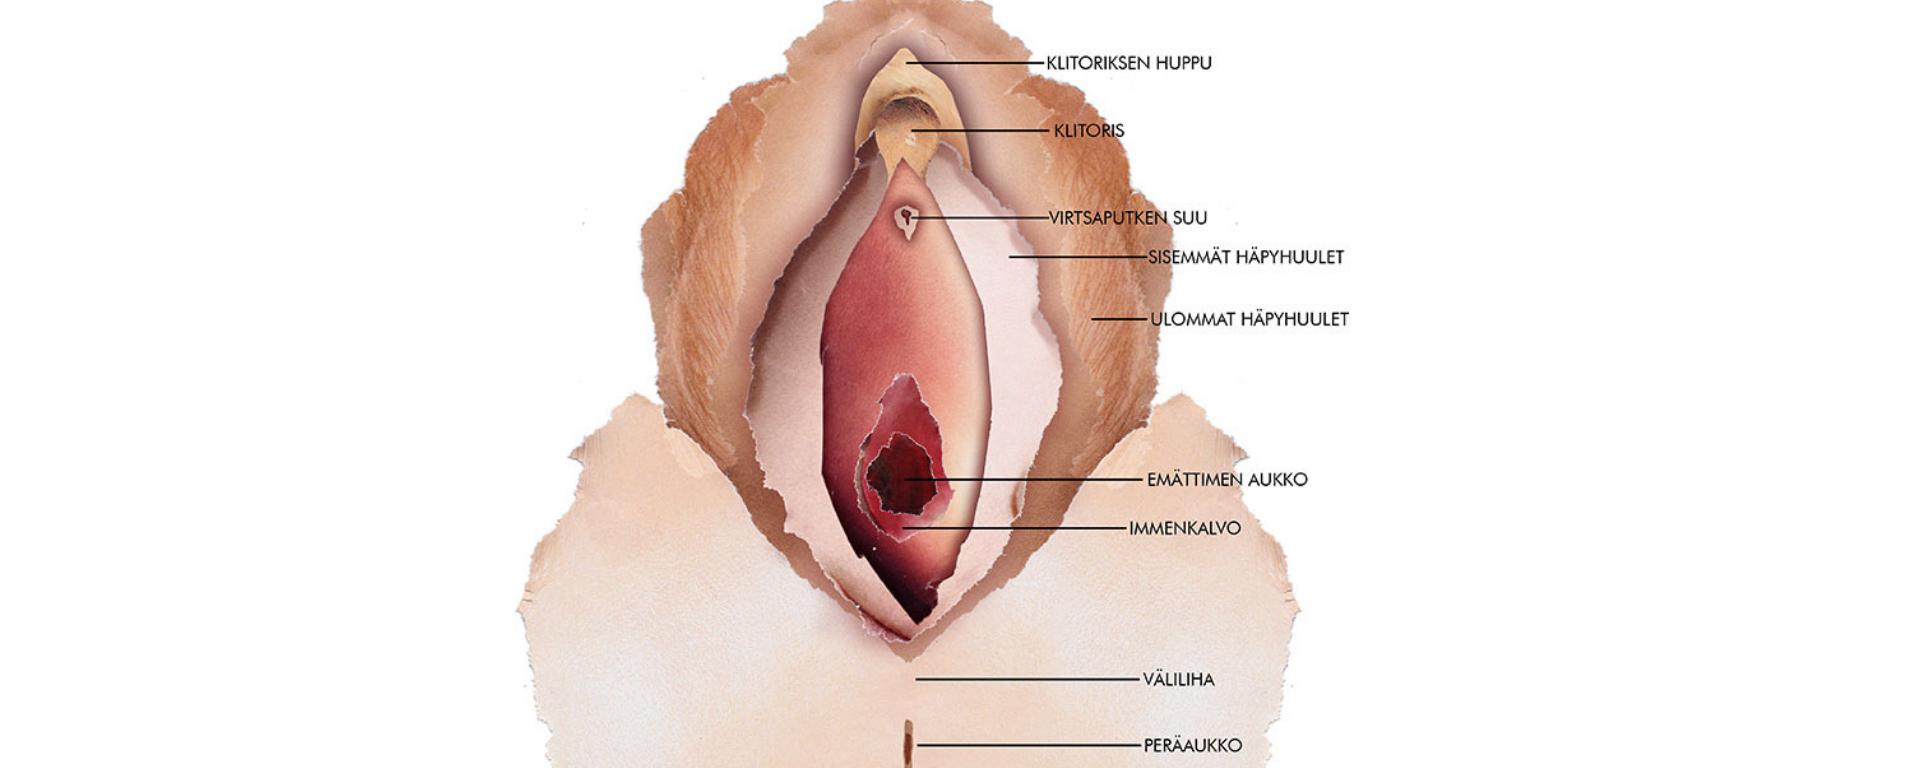 Vulvan anatomia -piirroskuva.